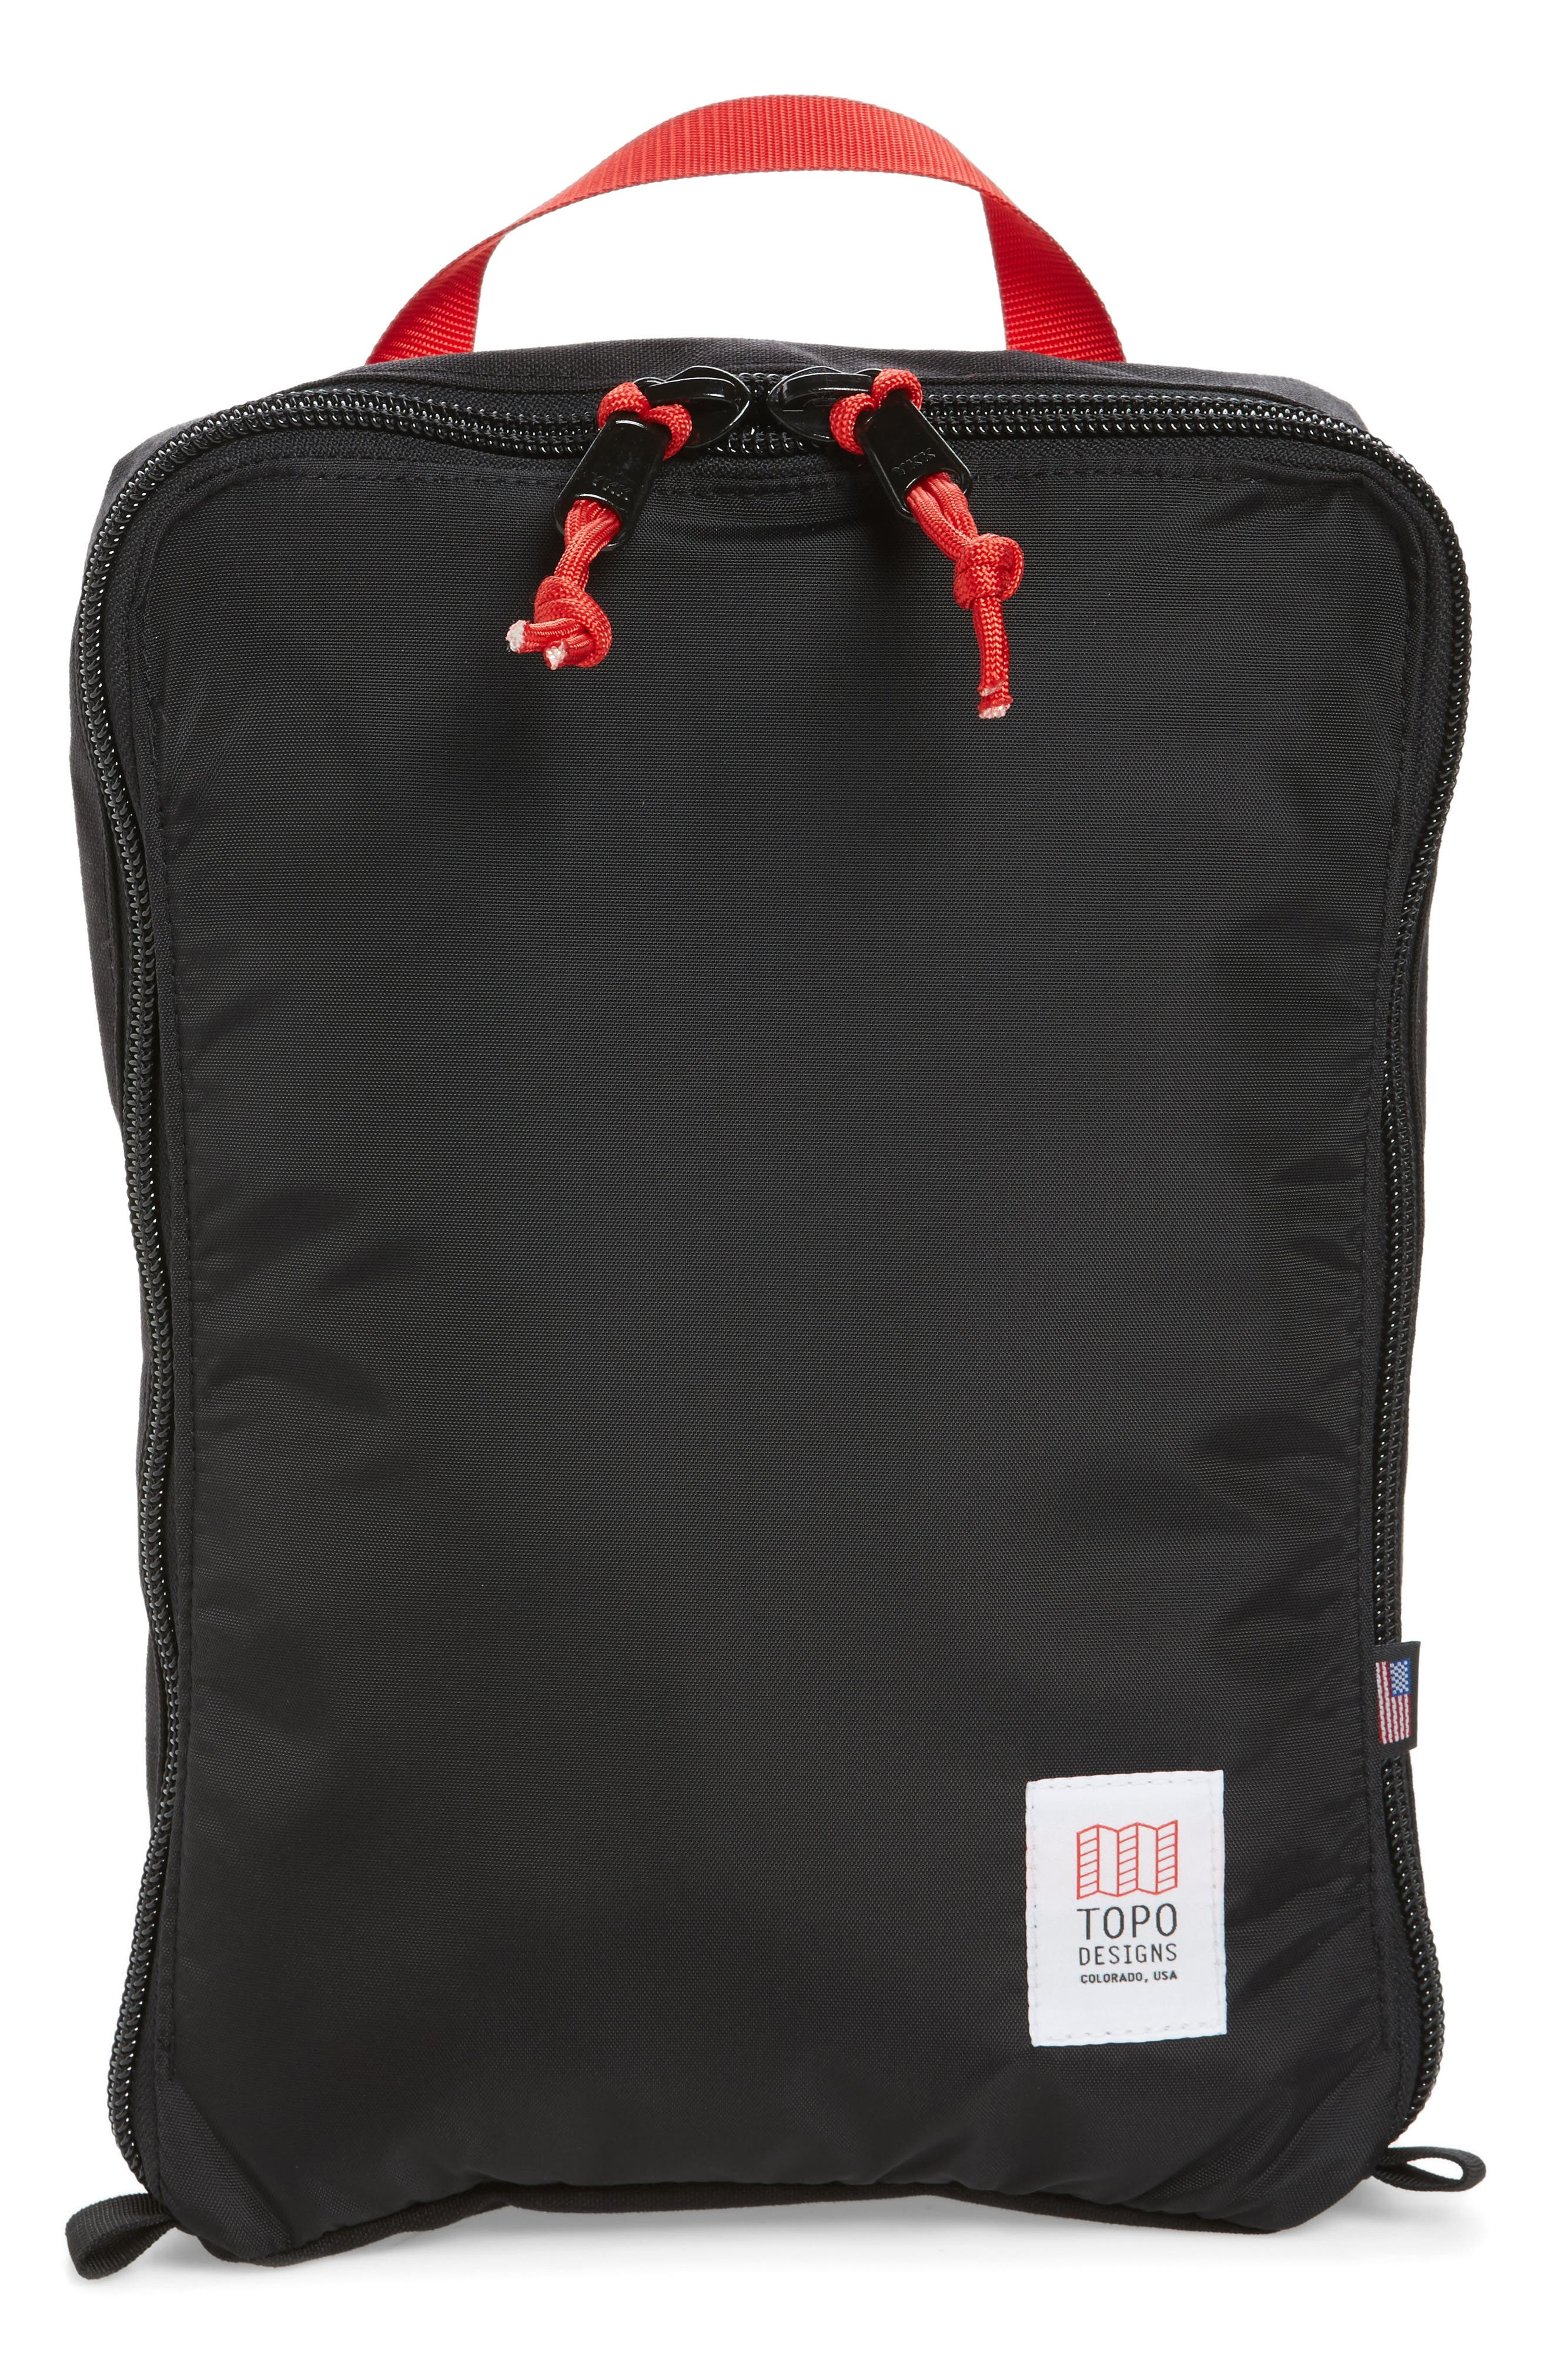 Topo Designs Pack Bags Tote